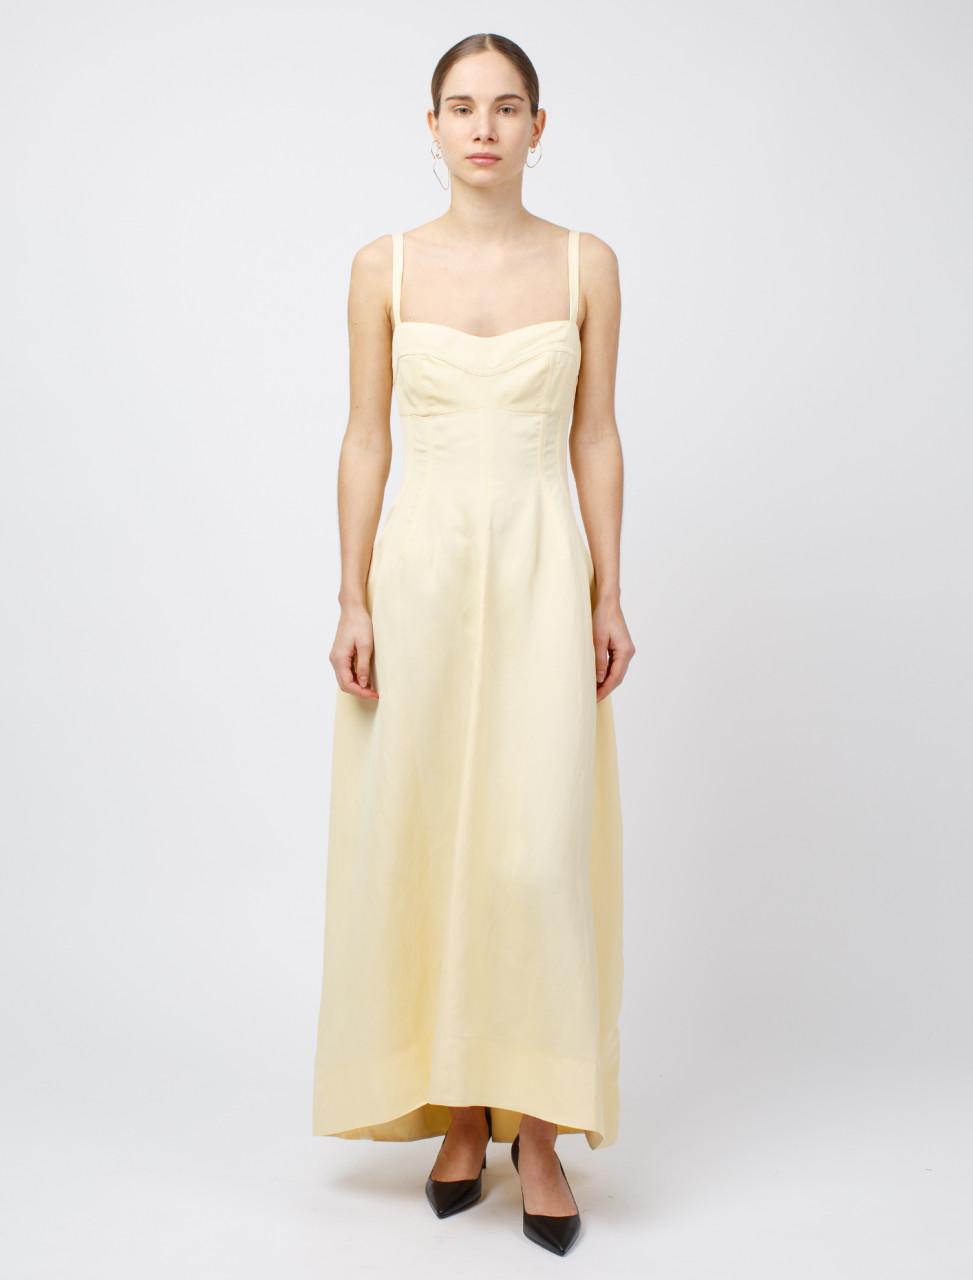 Sleeveless Bodice Dress in Natural